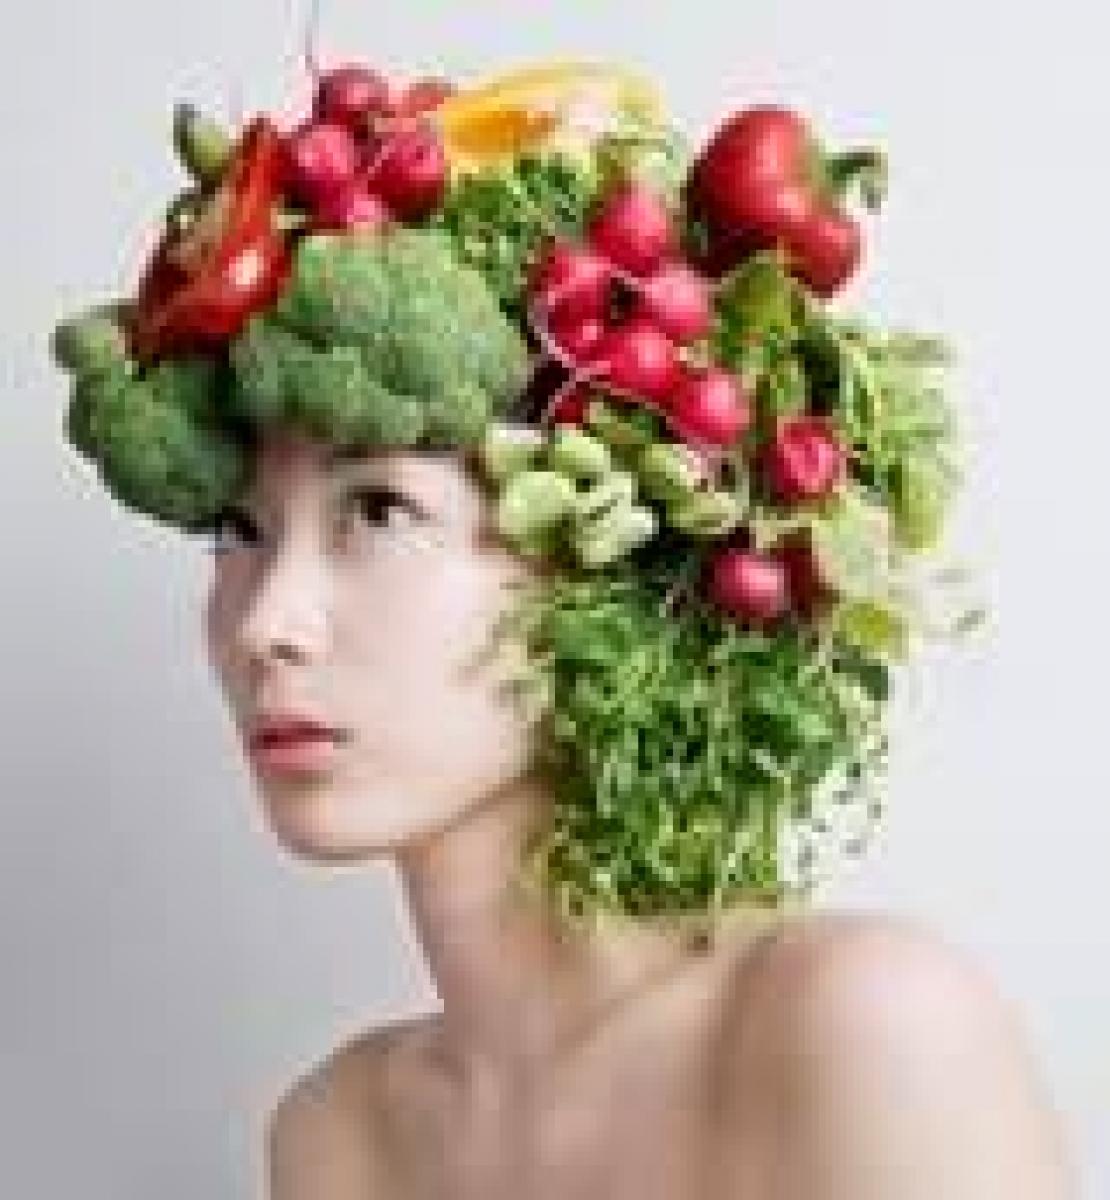 Vegetariani si nasce o si diventa?